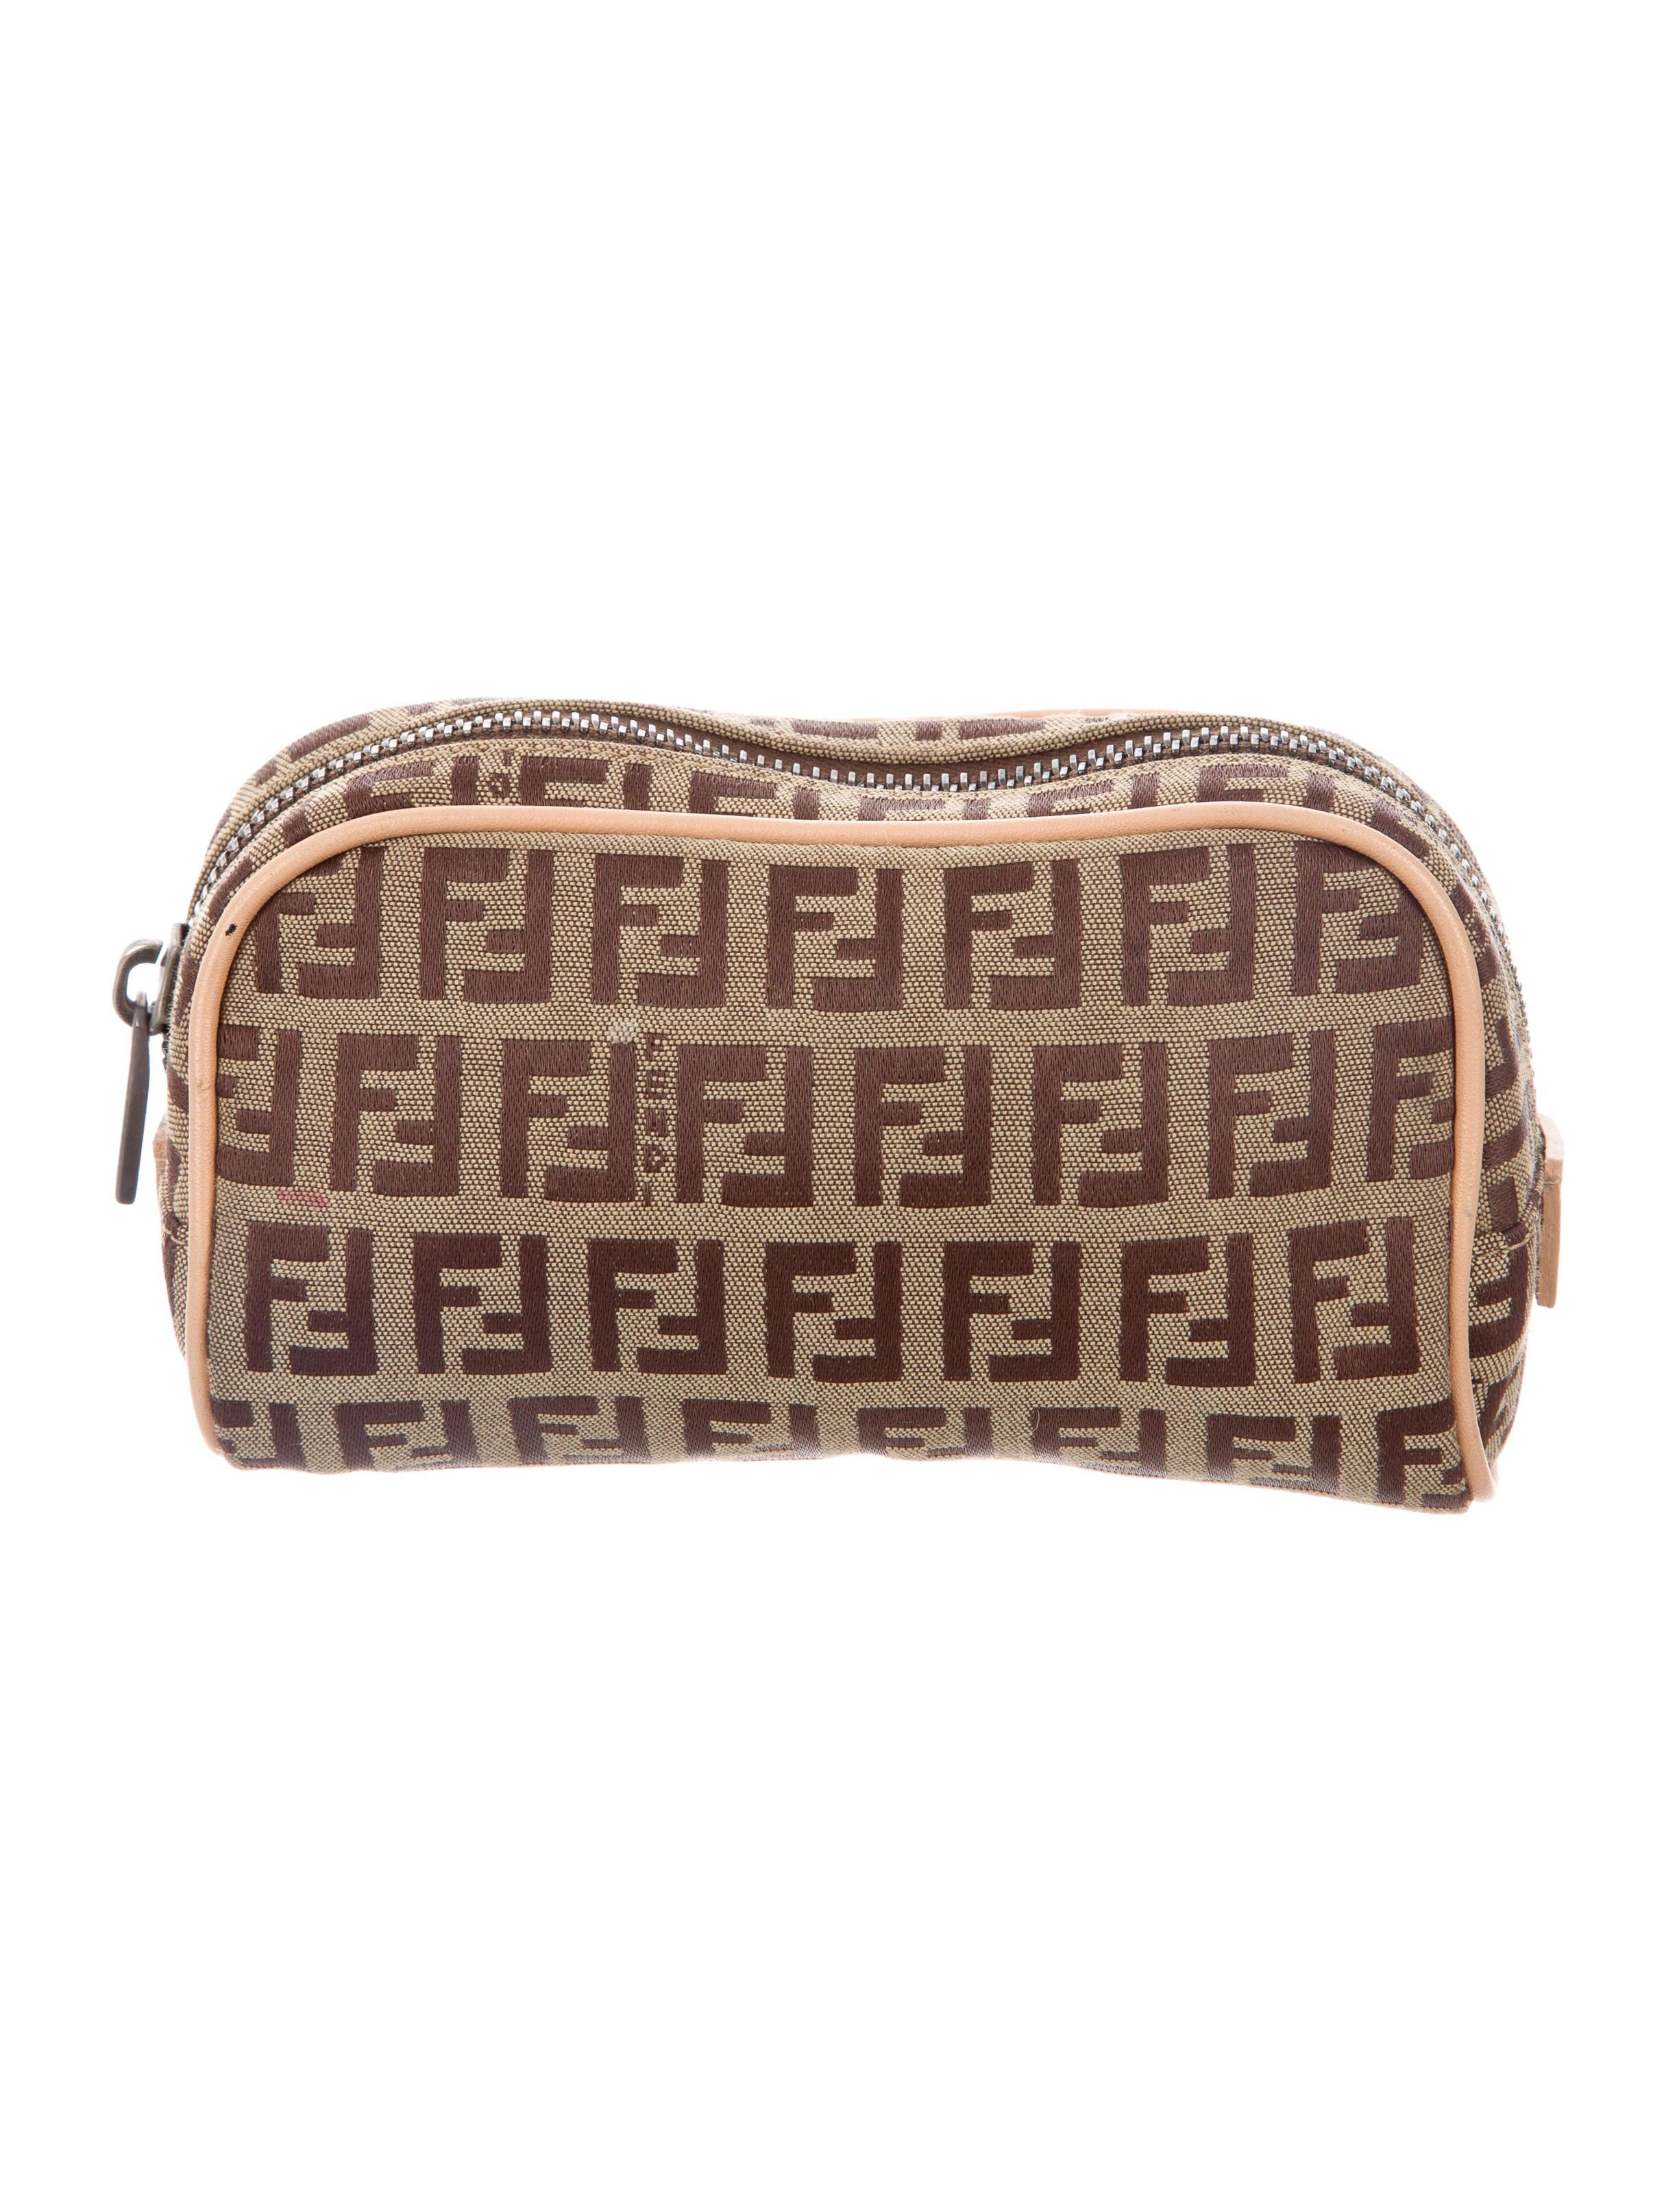 Fendi Zucchino Cosmetic Bag - Accessories - FEN65223  87988bd0212ee